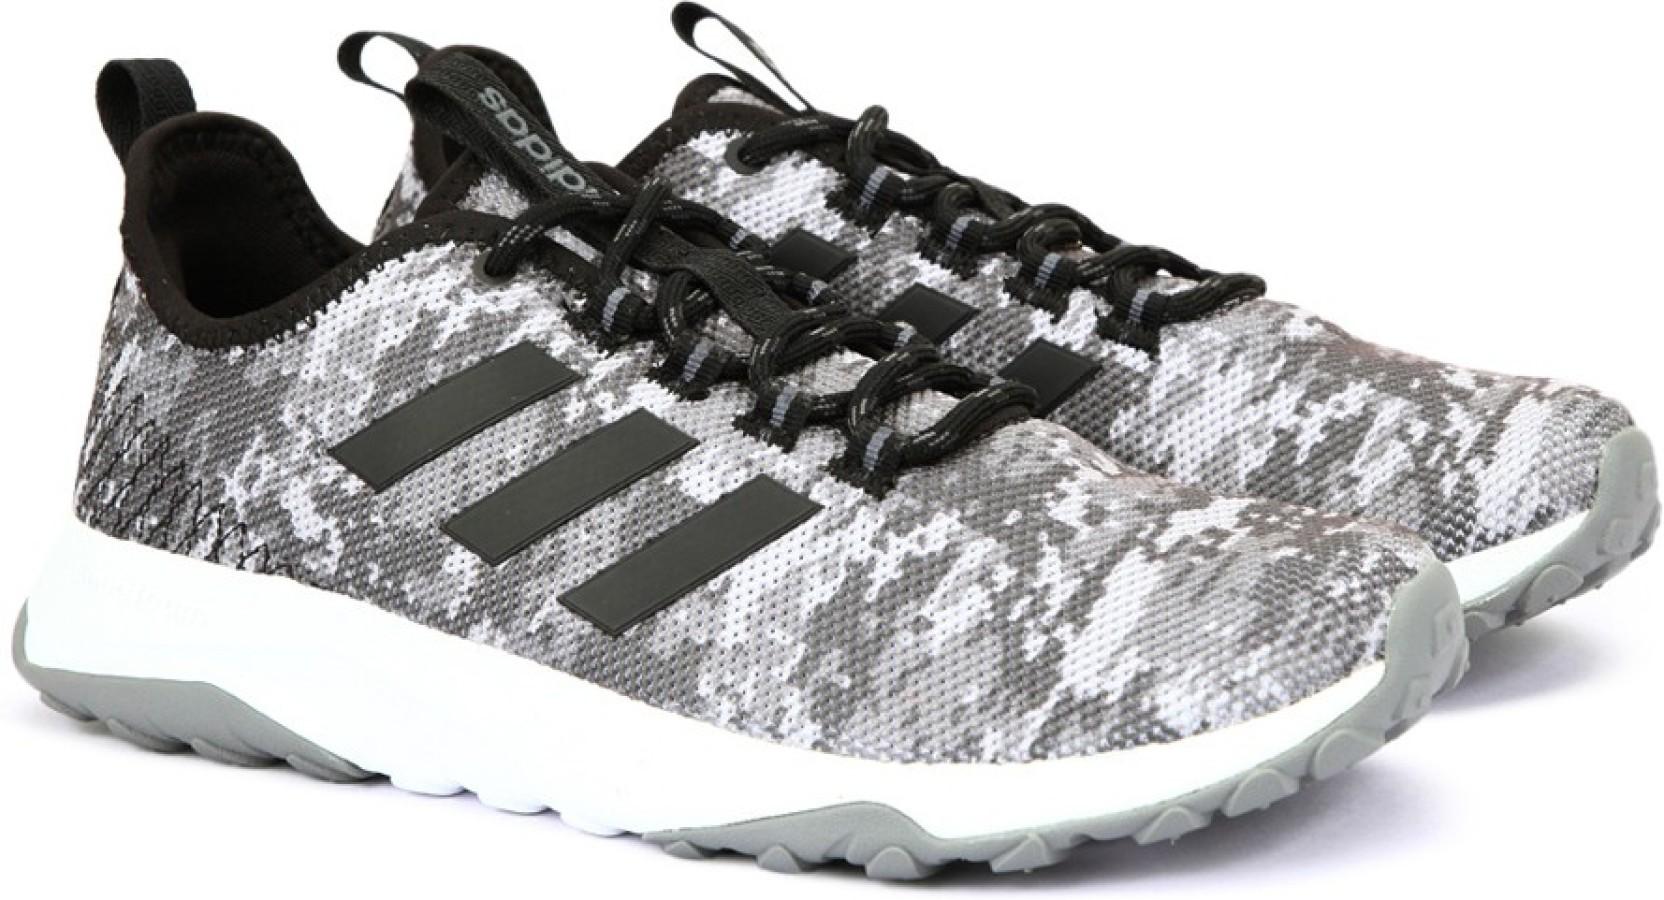 7ed40aa4e6e ADIDAS NEO CF SUPERFLEX TR Sneakers For Men